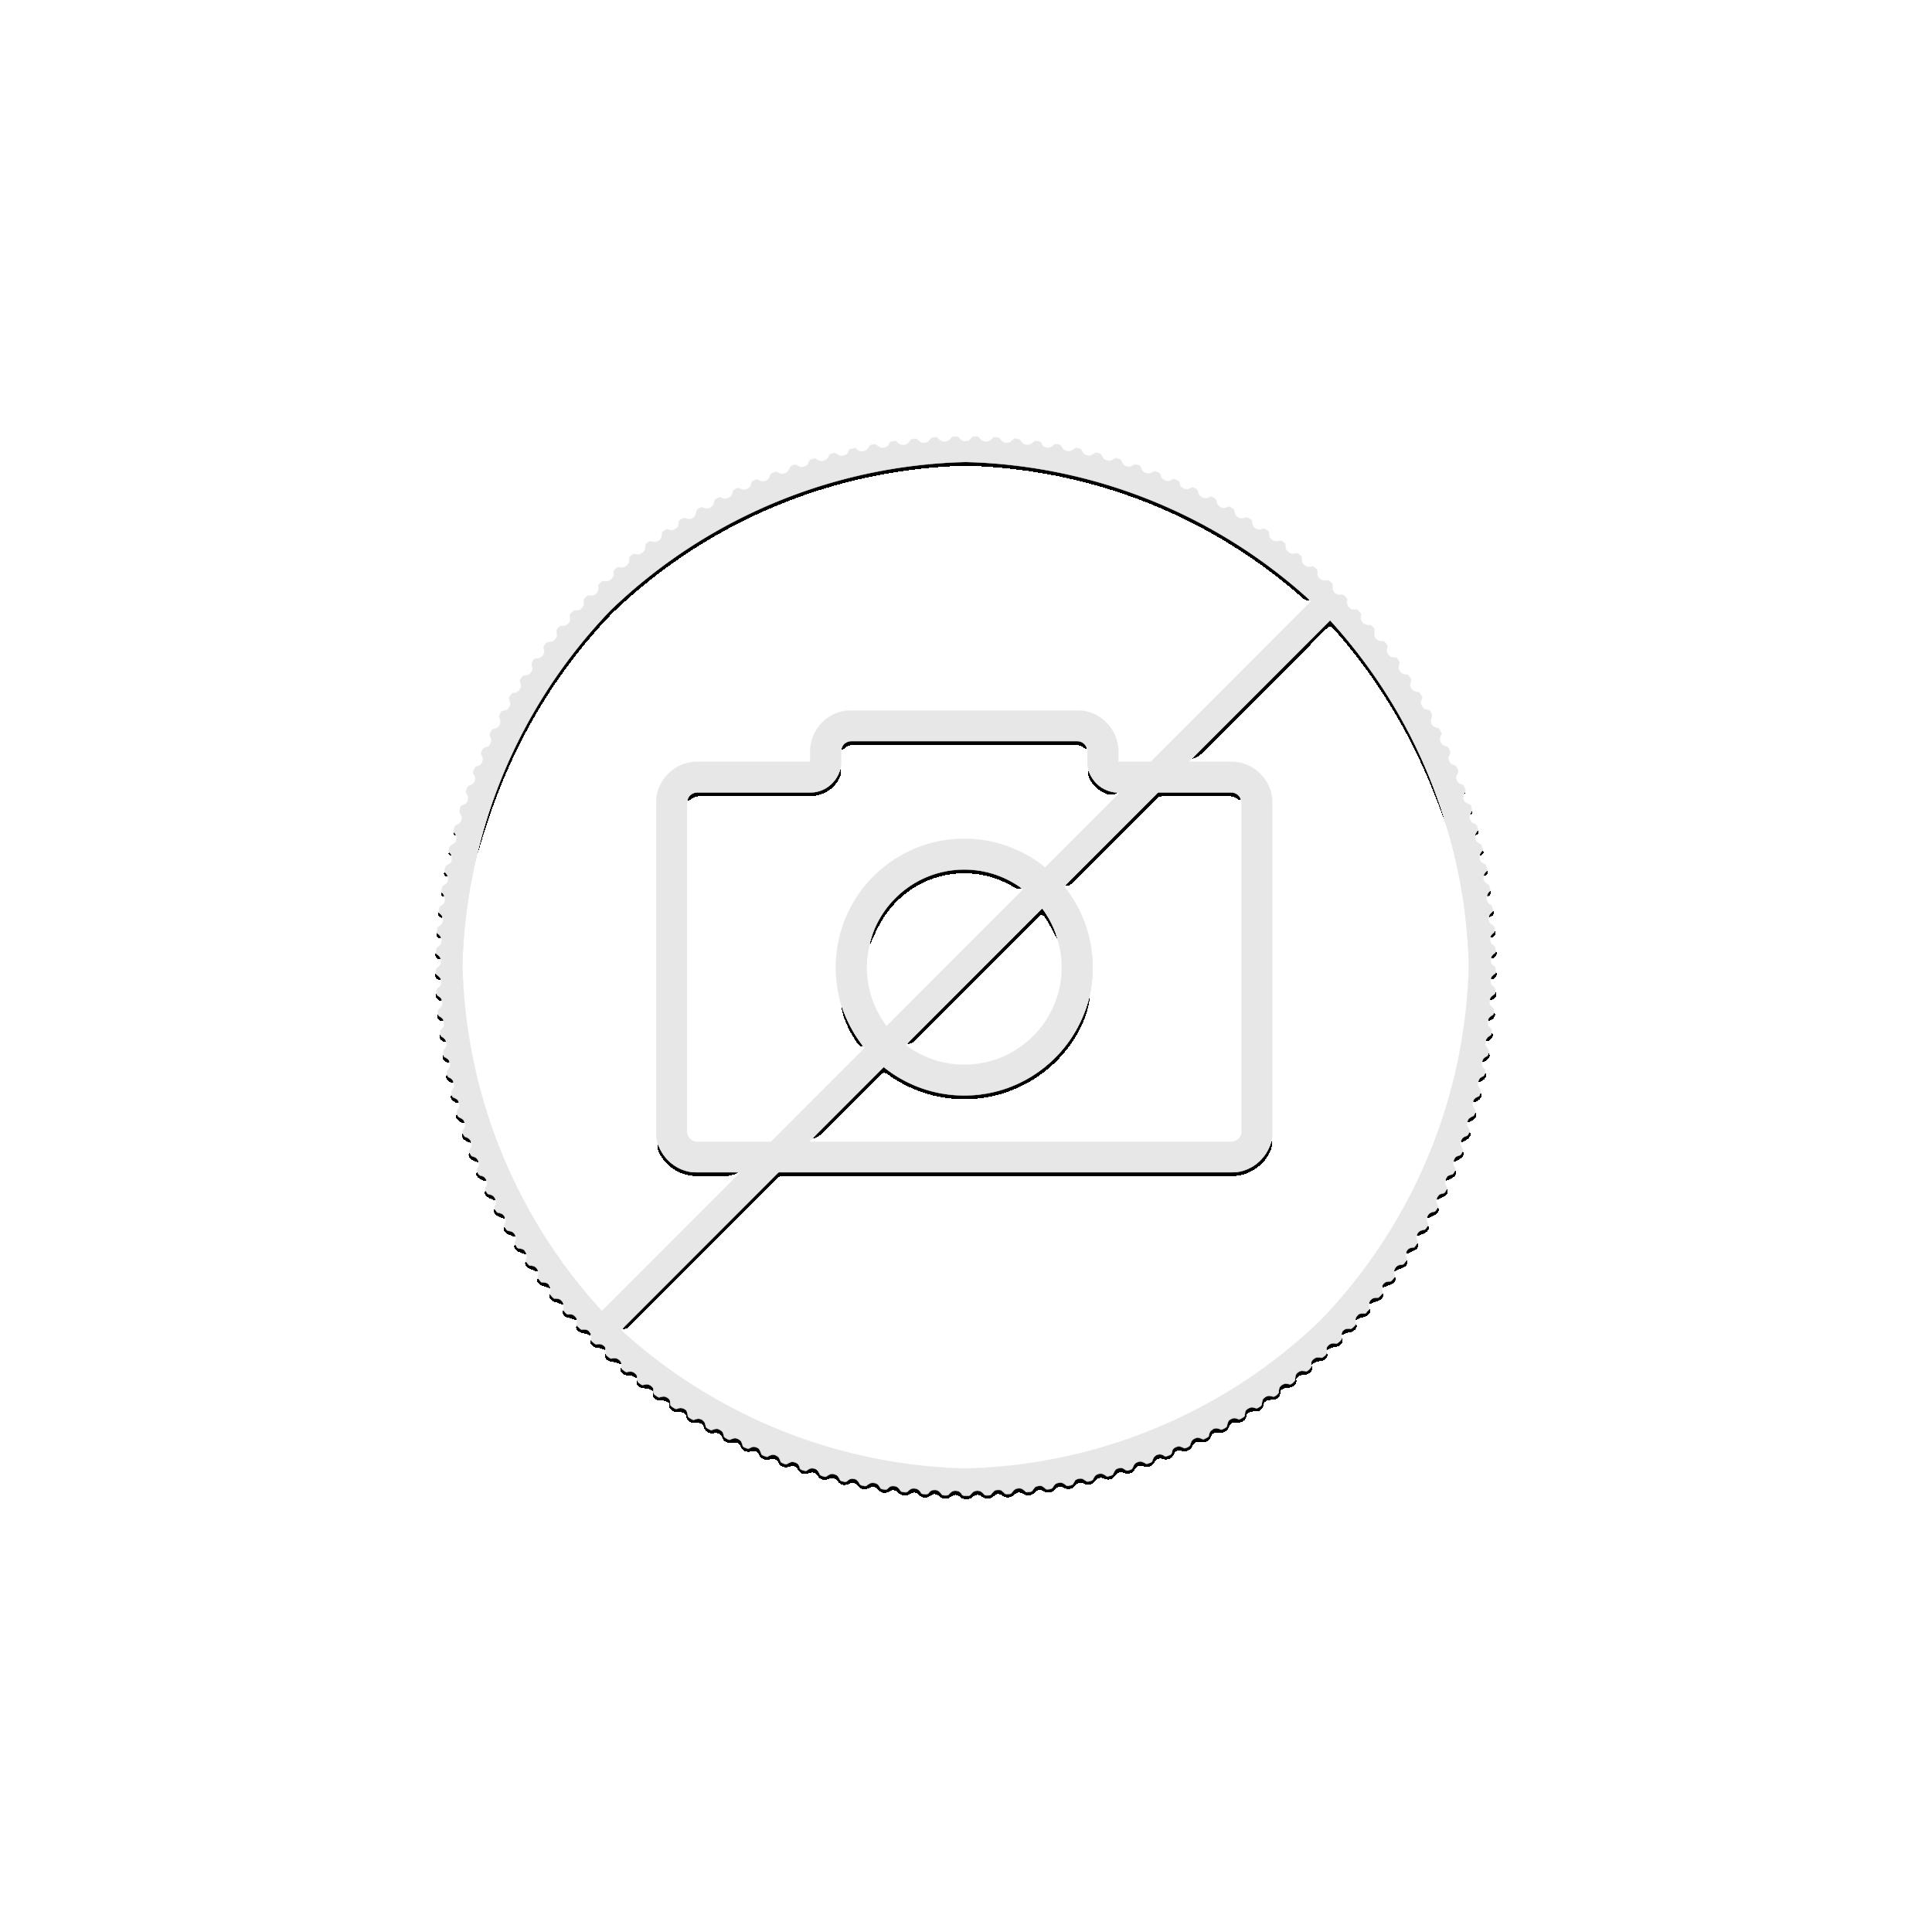 1 troy ounce zilveren munt Up close kangaroo 2021